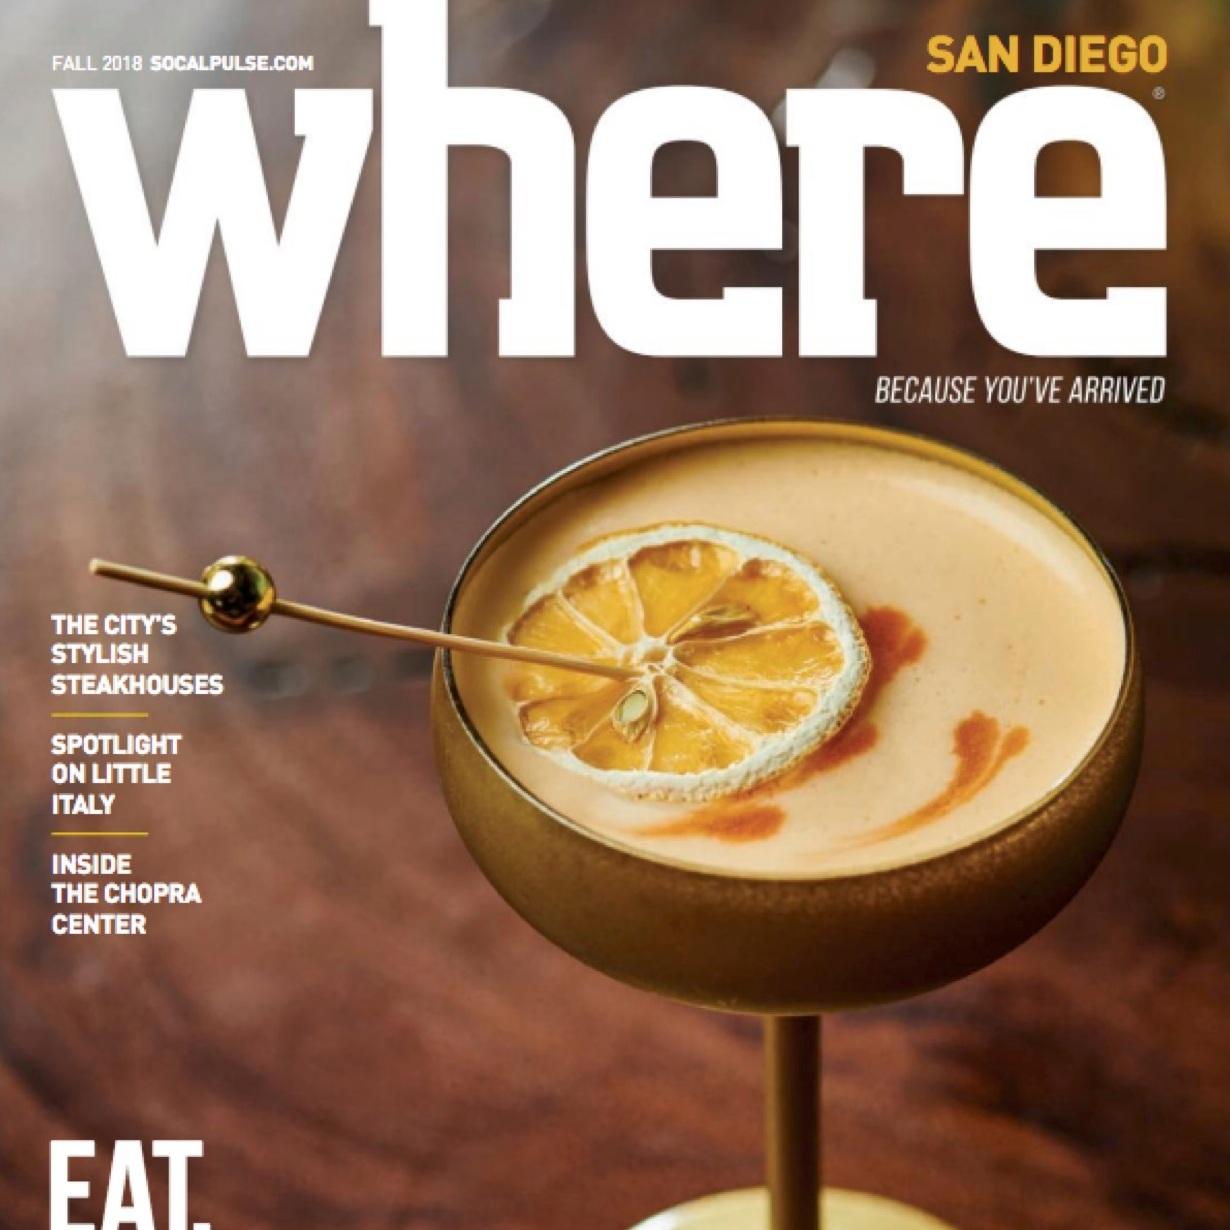 San+Diego+Where+%7C+Smokeyard